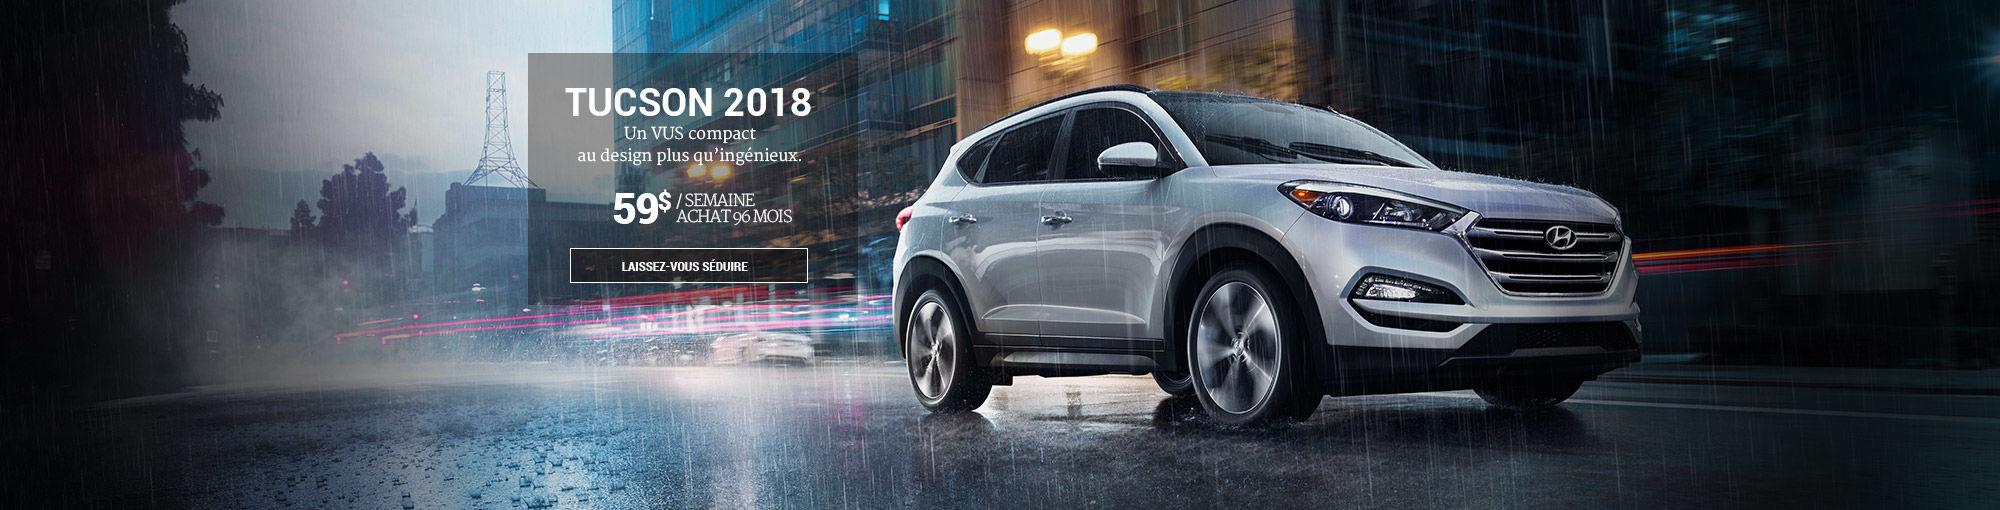 Hyundai Tucson 2018 header juillet